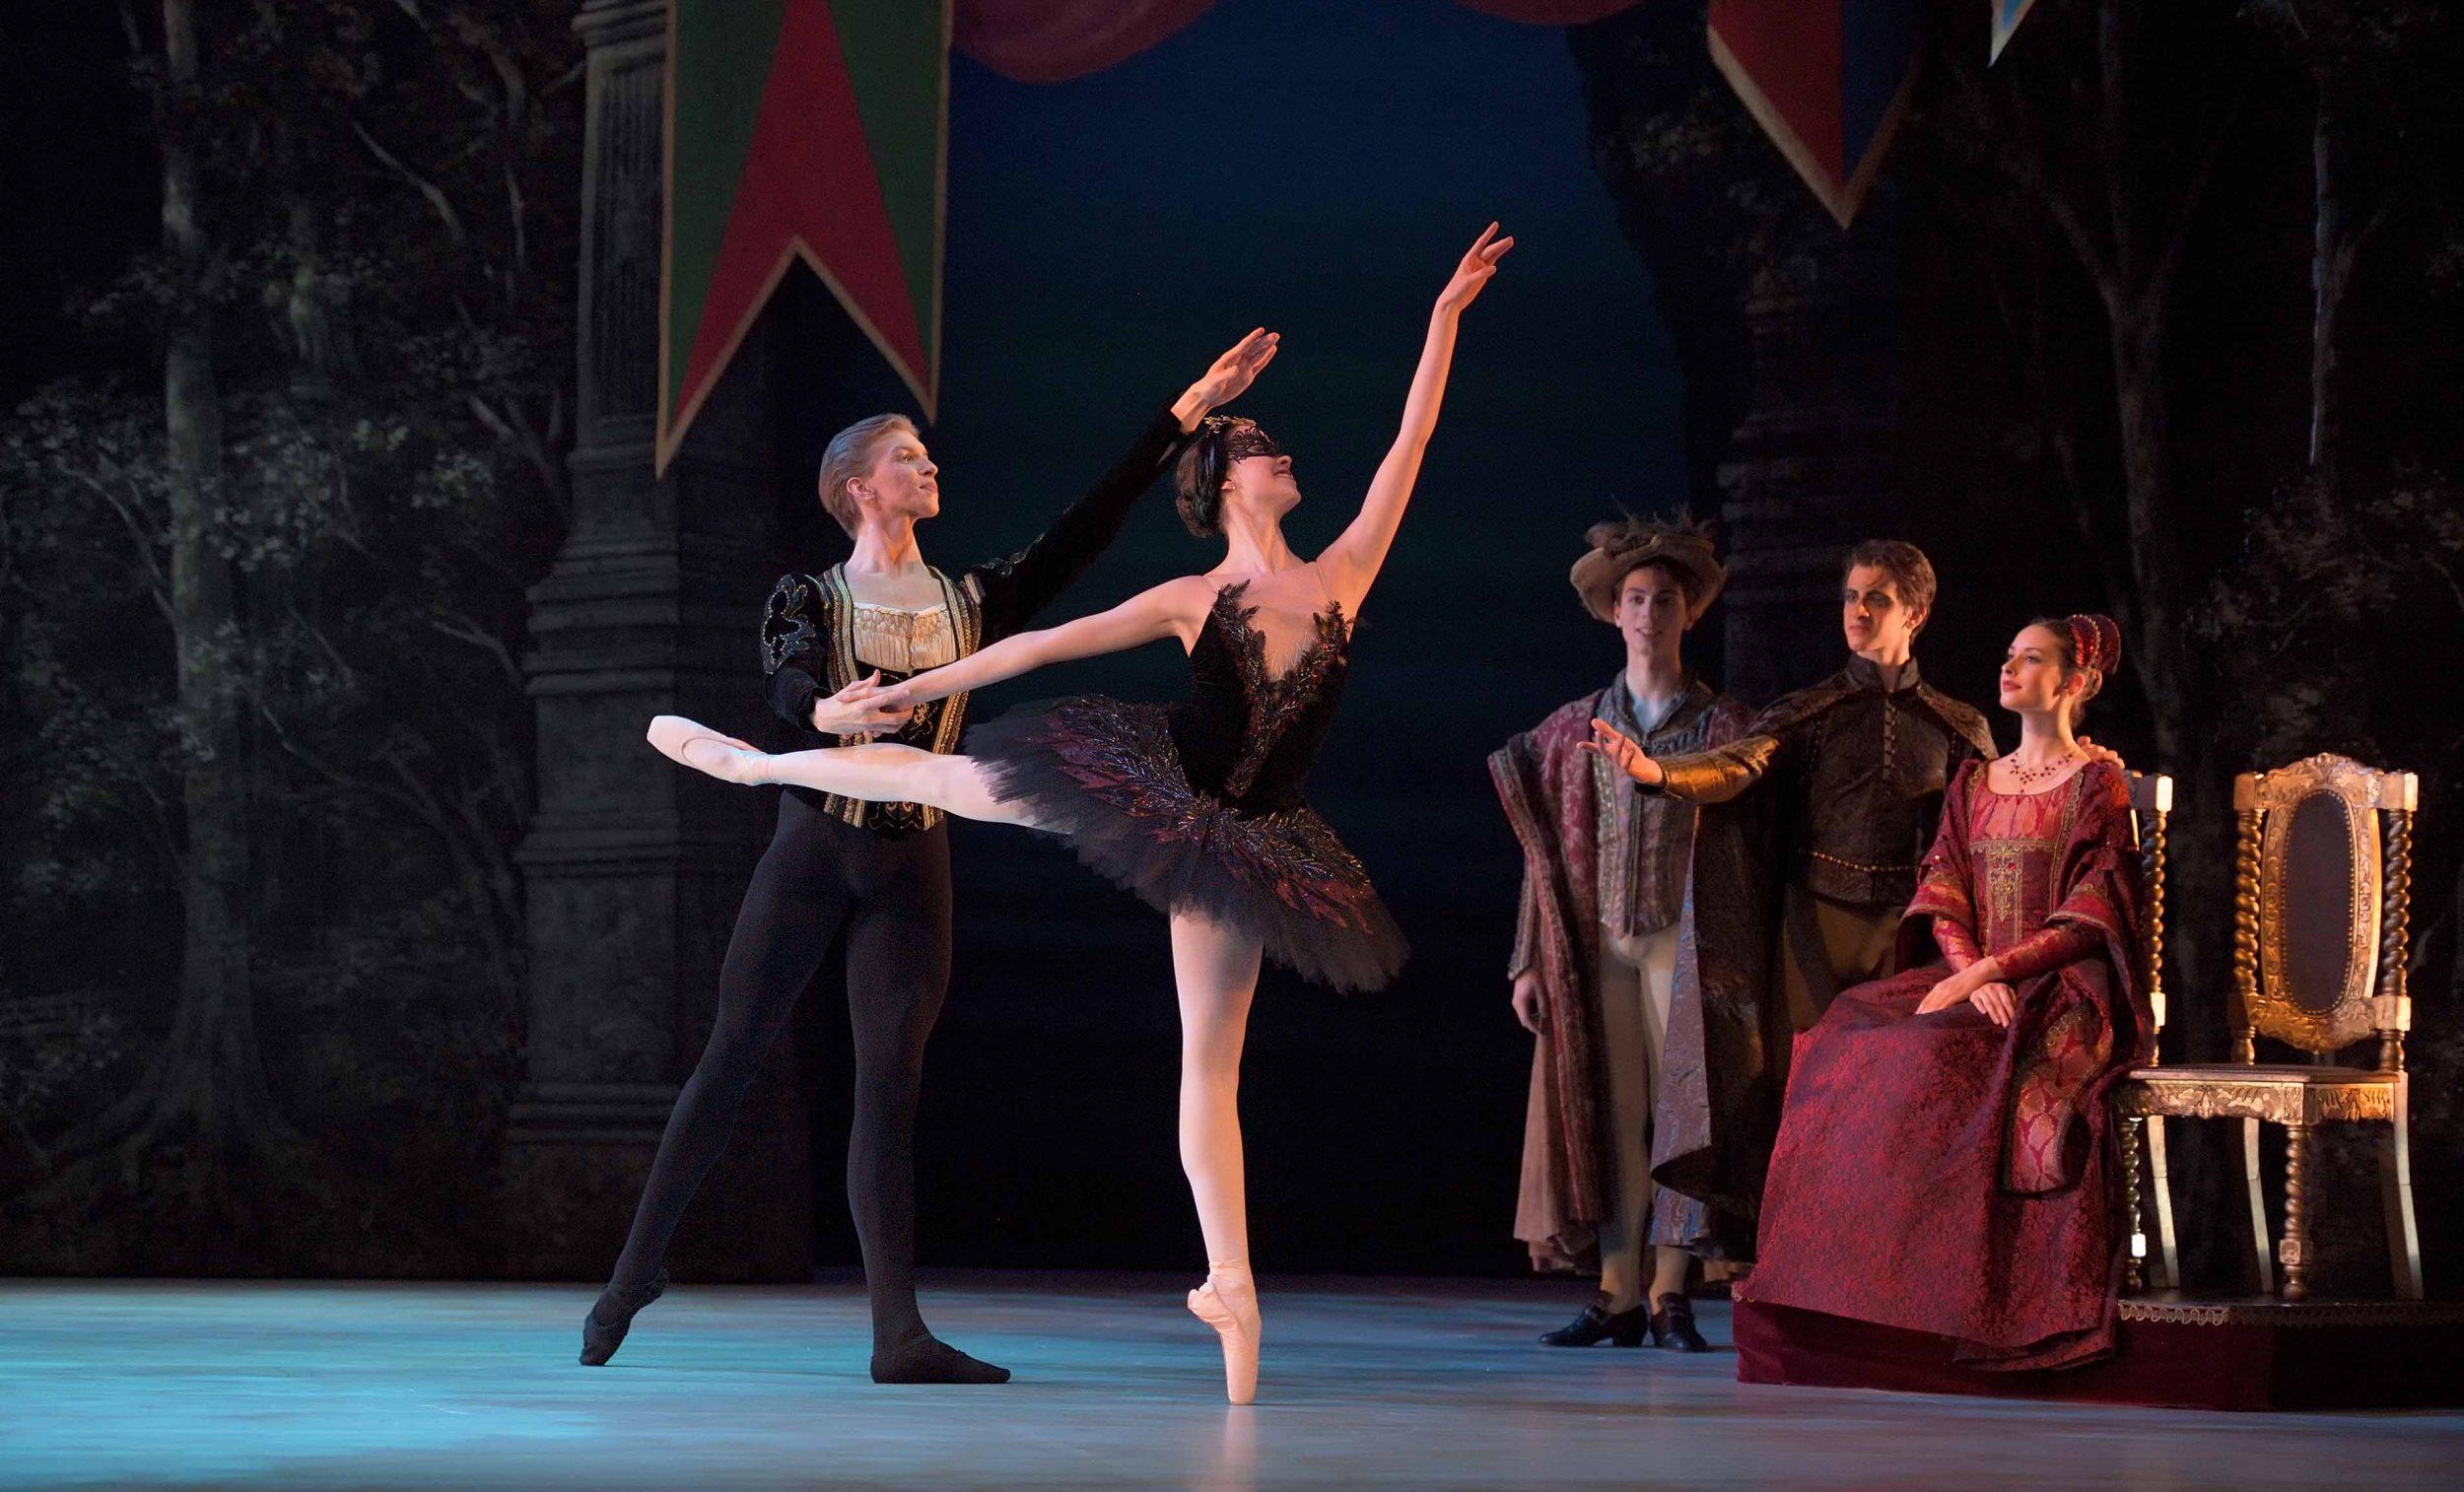 Harvey-Littlefield-as-Prince-Siegfried-Beatriz-Kuperus-as-Odile-My-First-Ballet-Swan-Lake©Laurent-Liotardo